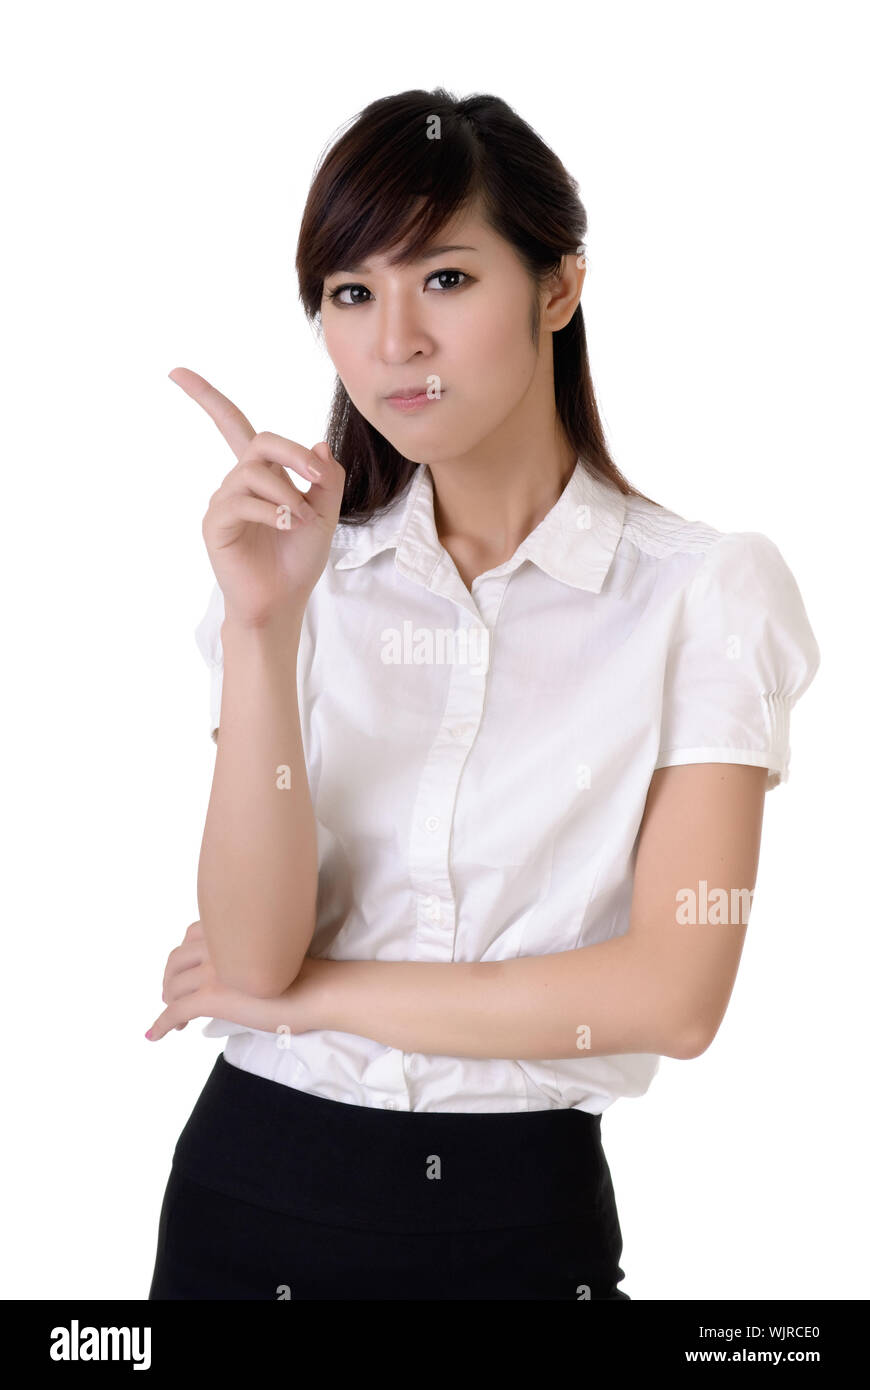 Closeup portrait of business woman reject you with confident